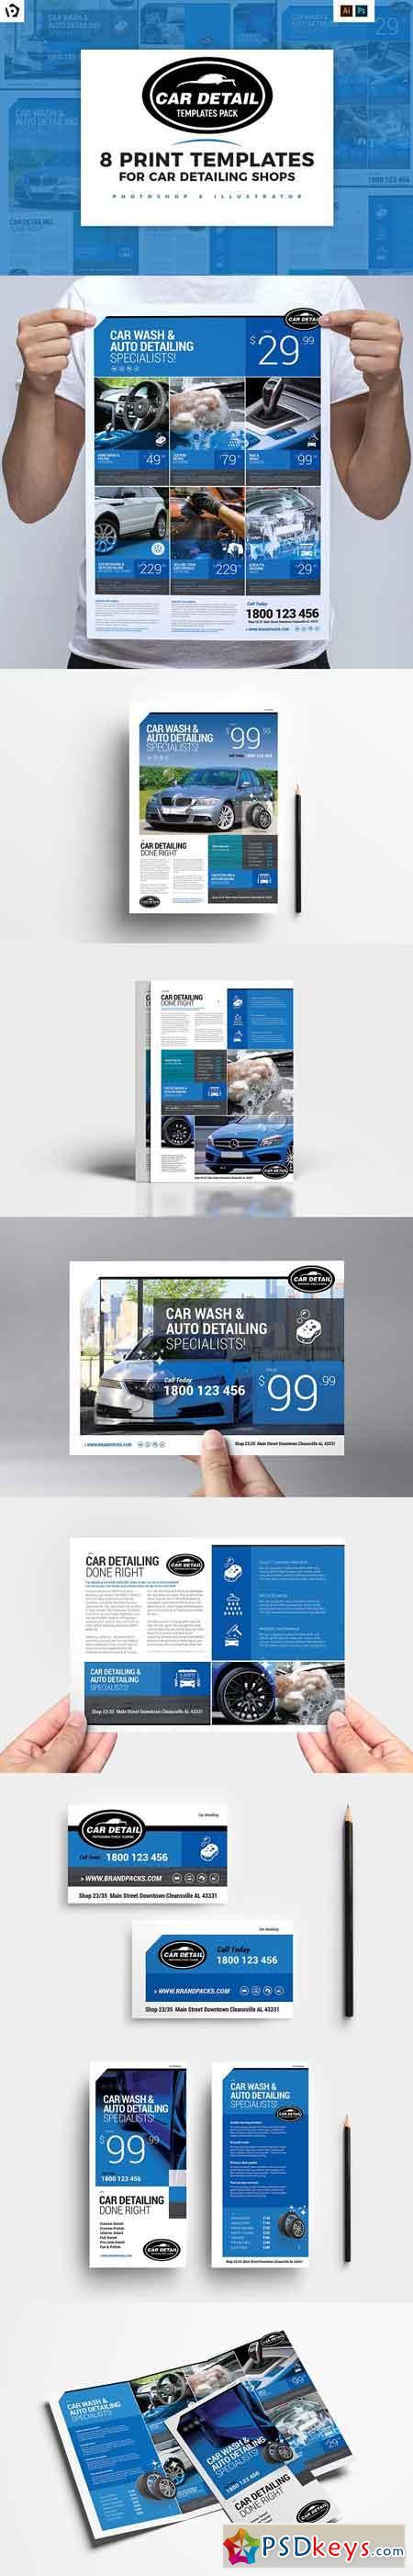 Car Detailing Templates Pack 2959609